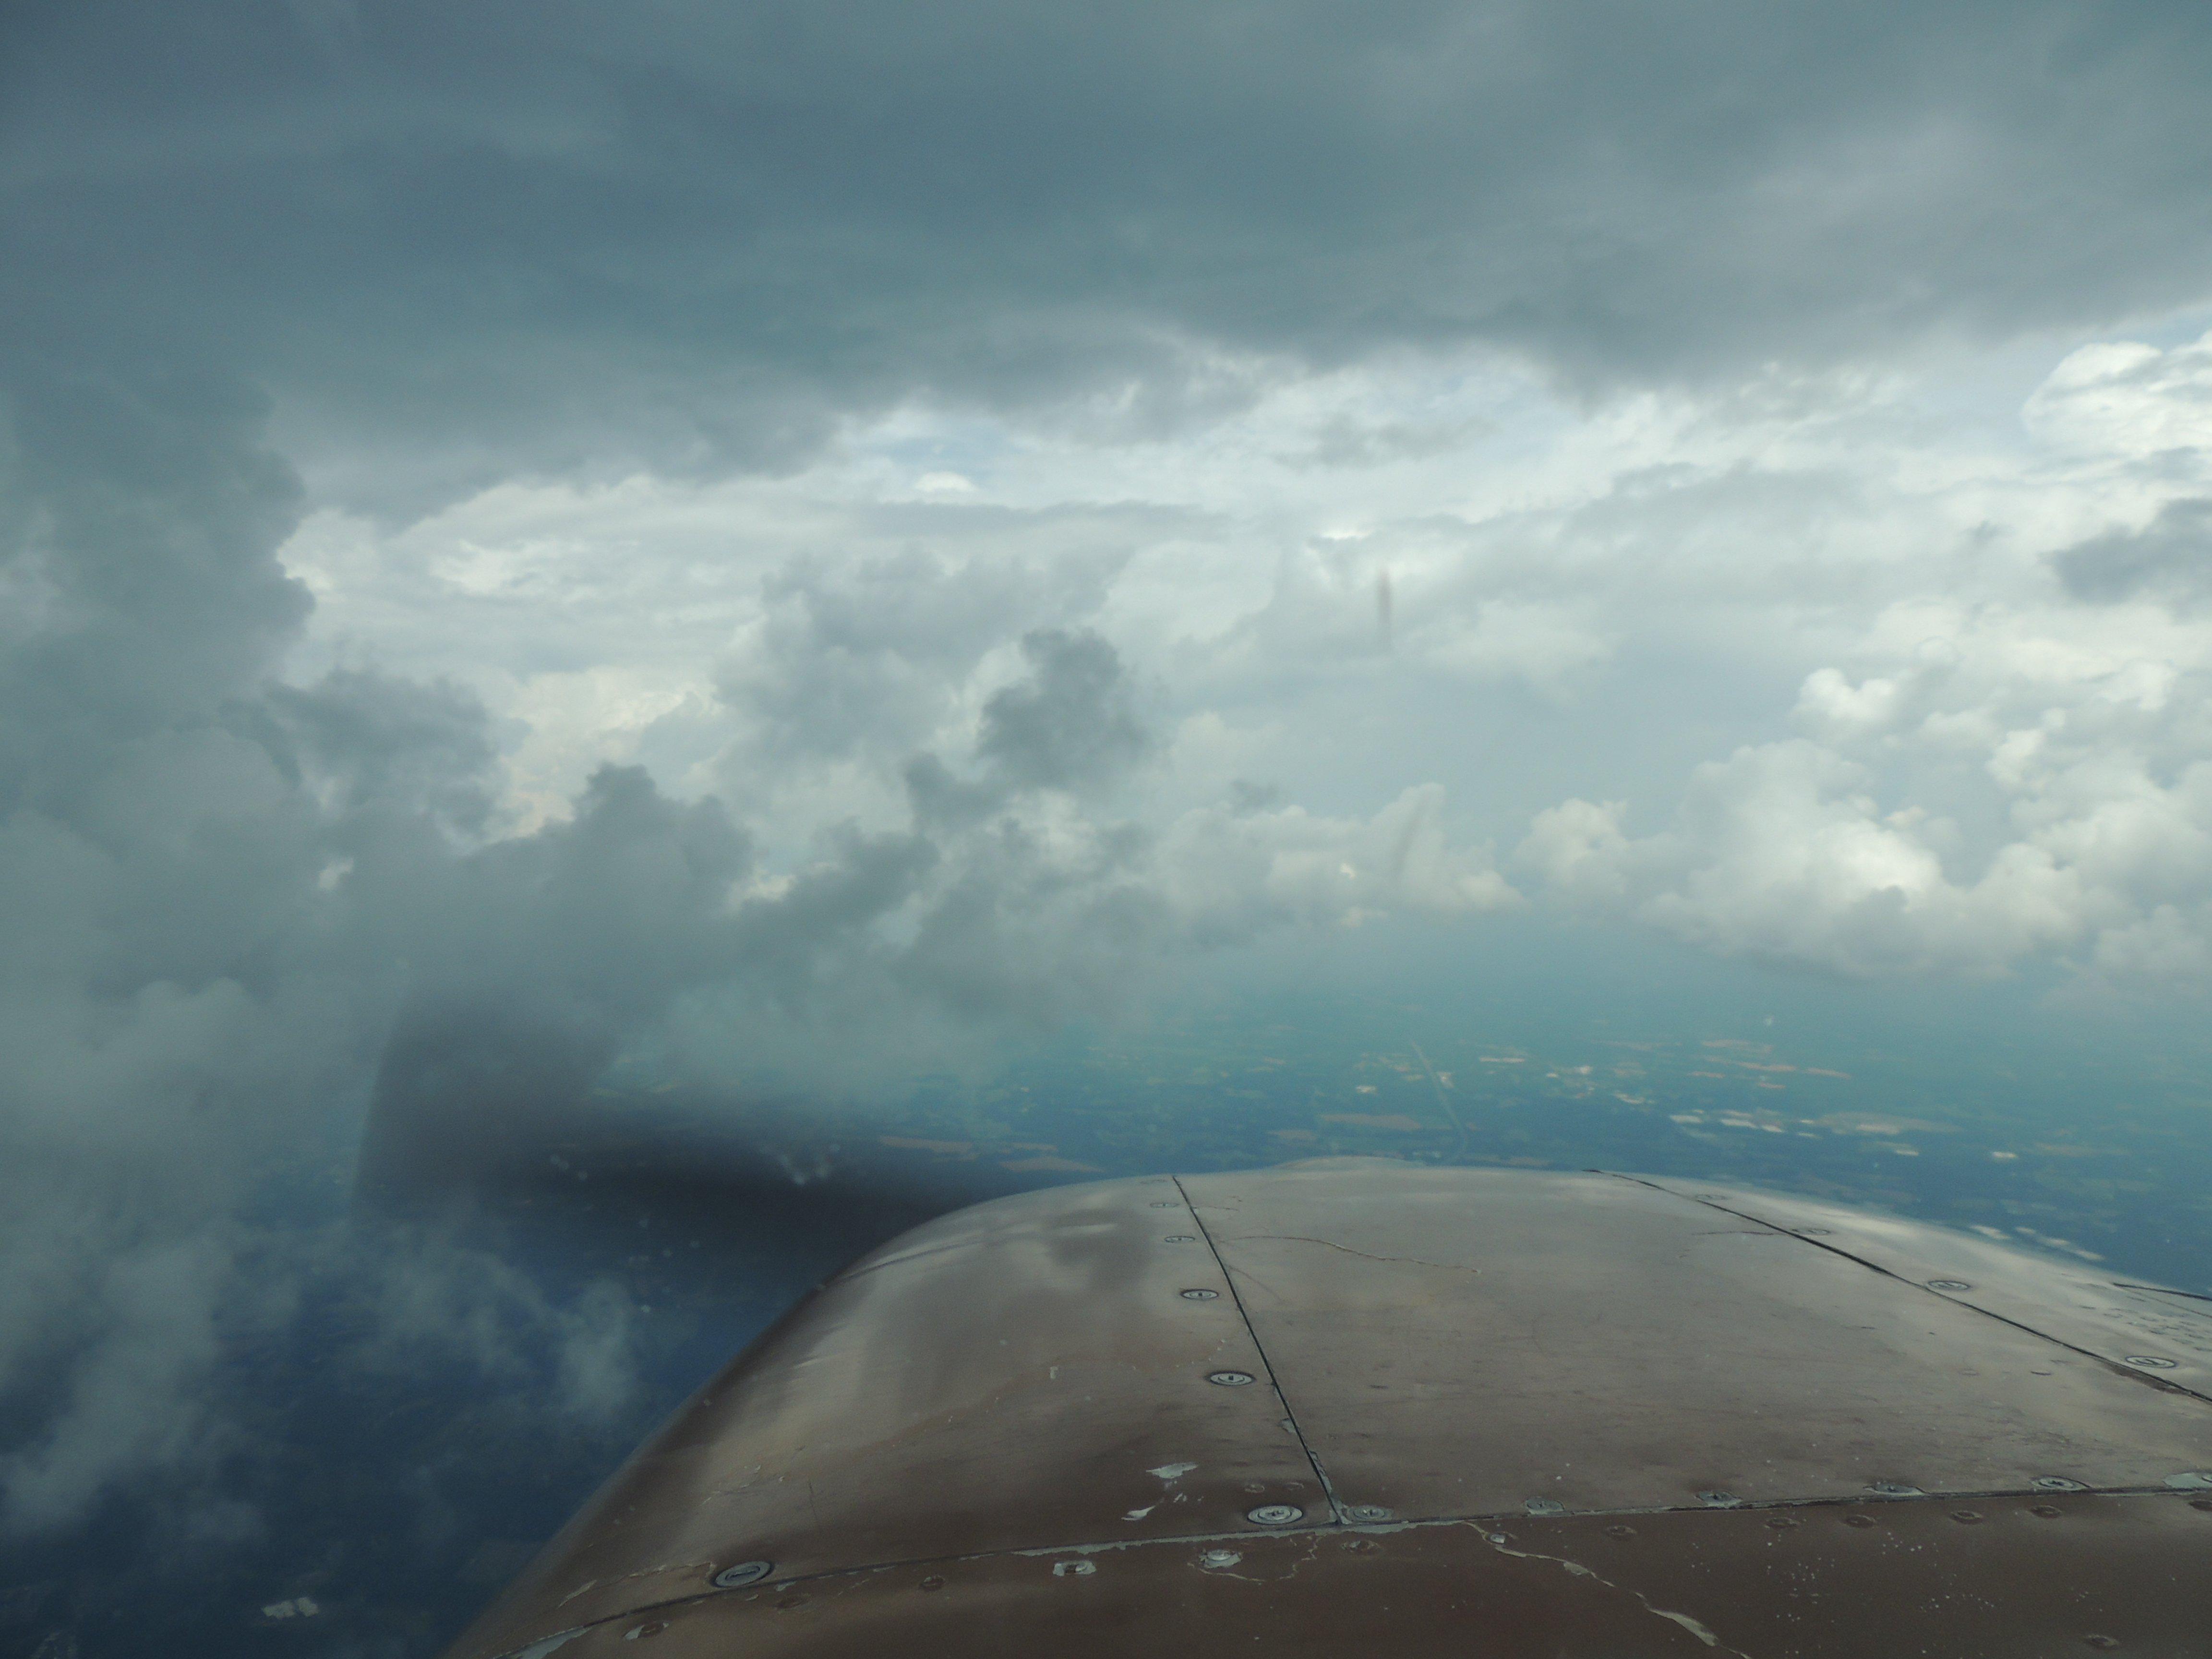 Heading to Greensboro NC